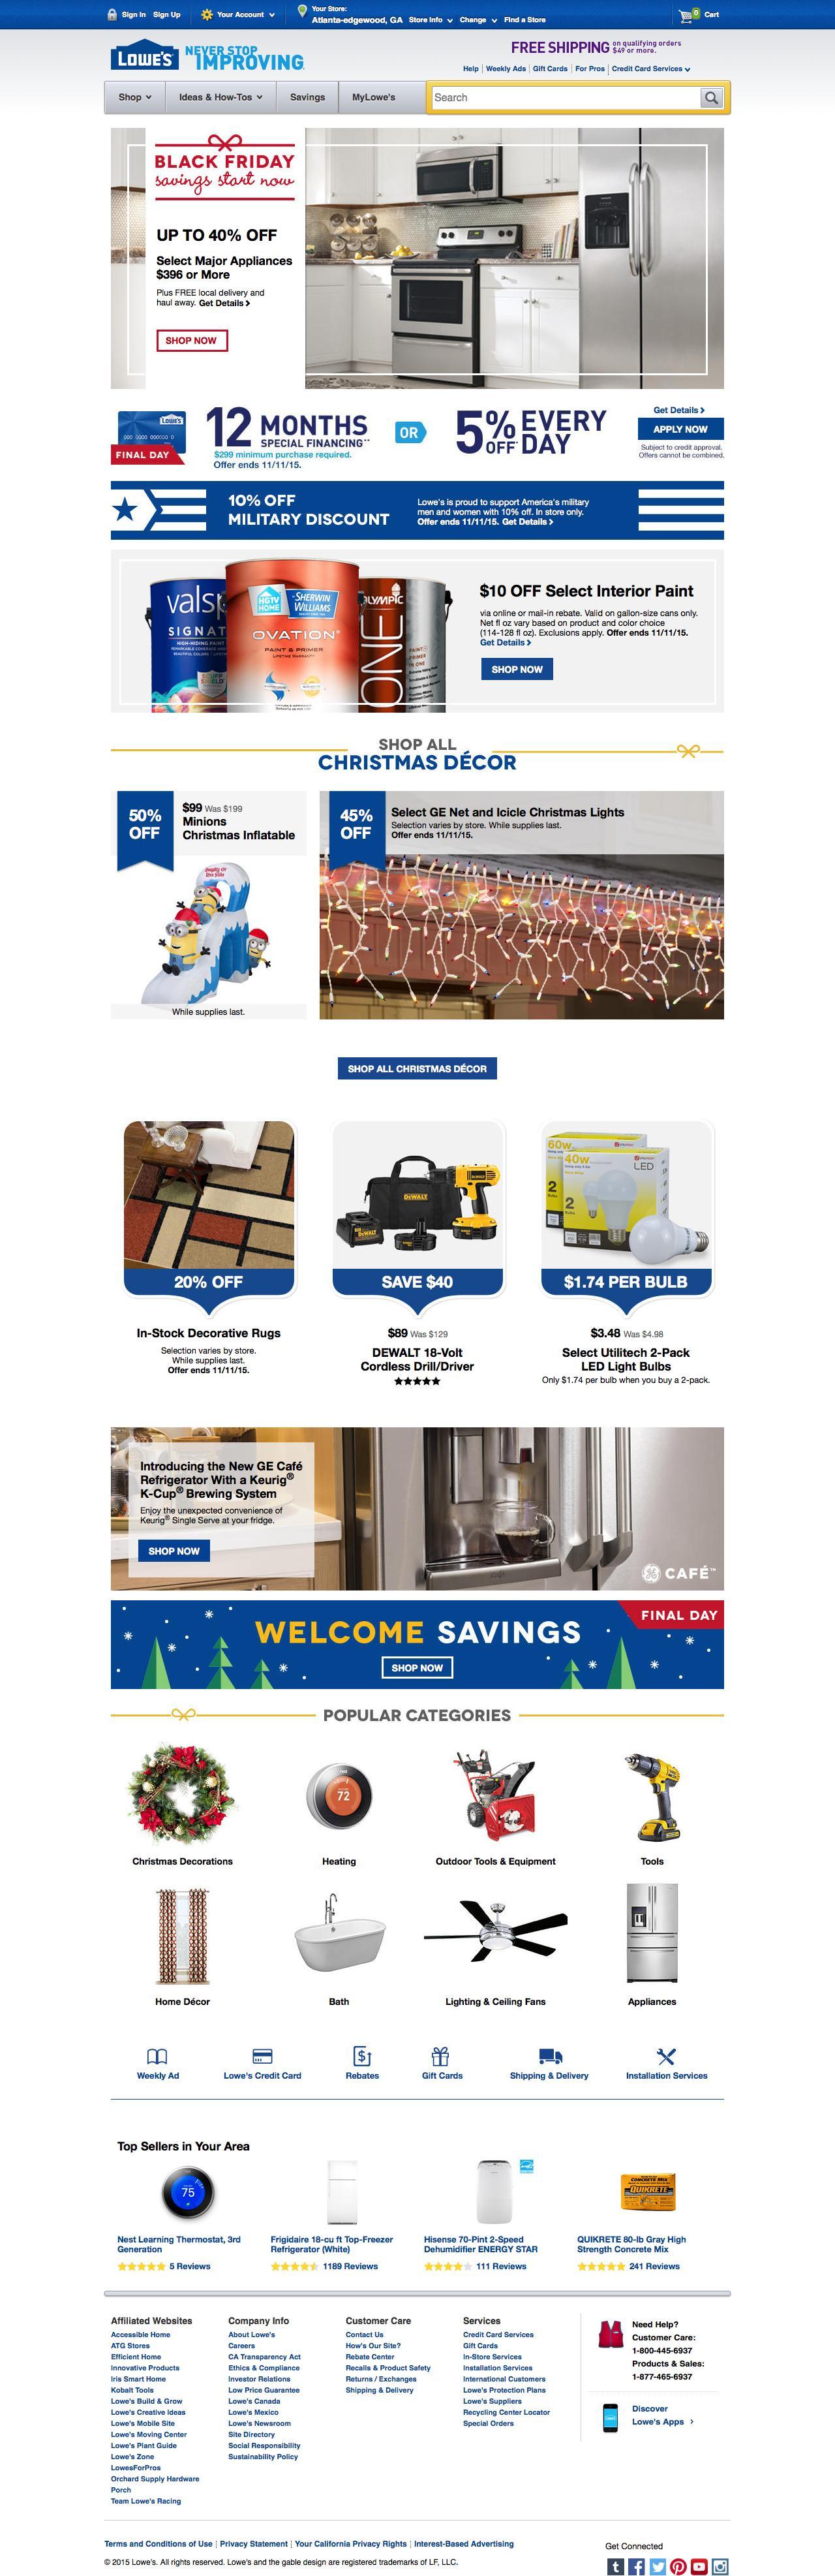 Screenshot of lowes.com - Lowe's Home Improvement: Appliances, Tools, Hardware, Paint, Flooring - captured Nov. 11, 2015